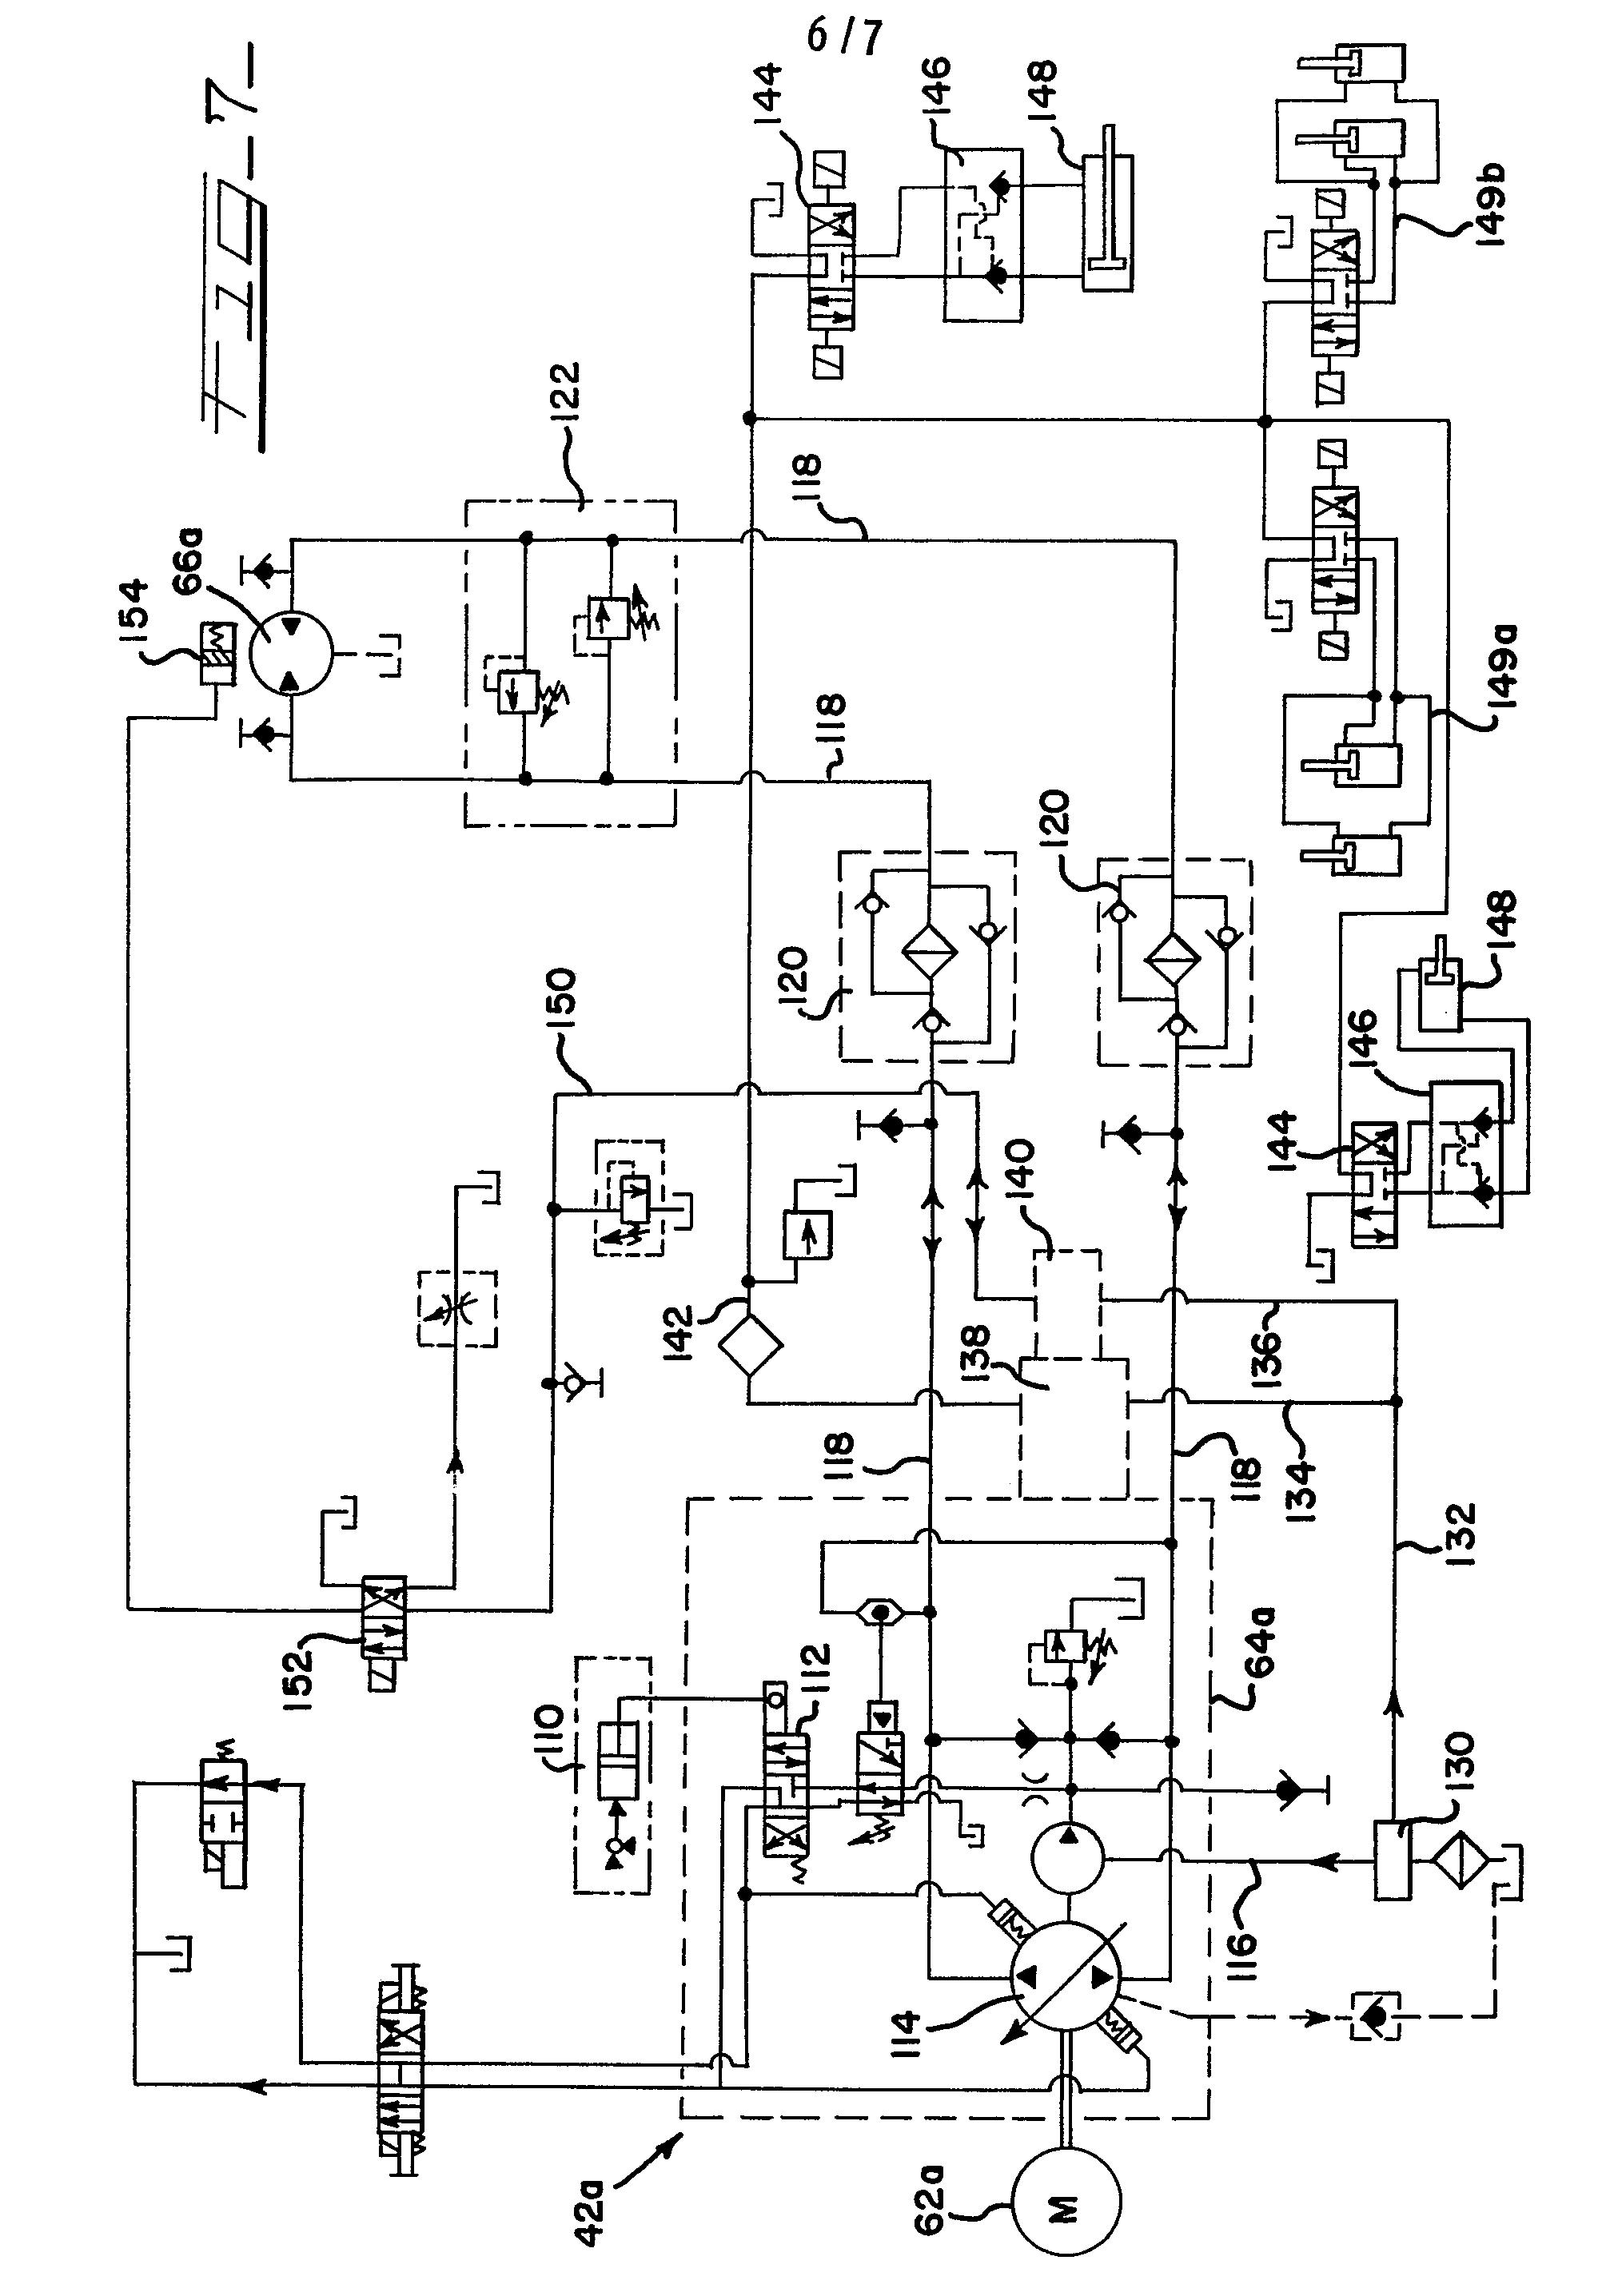 Overhead Bridge Crane Wiring Diagrams Cranes 2 Speed Diagram Coffing Exelent Vignette Best Images For Hinomoto Gantry Circuit